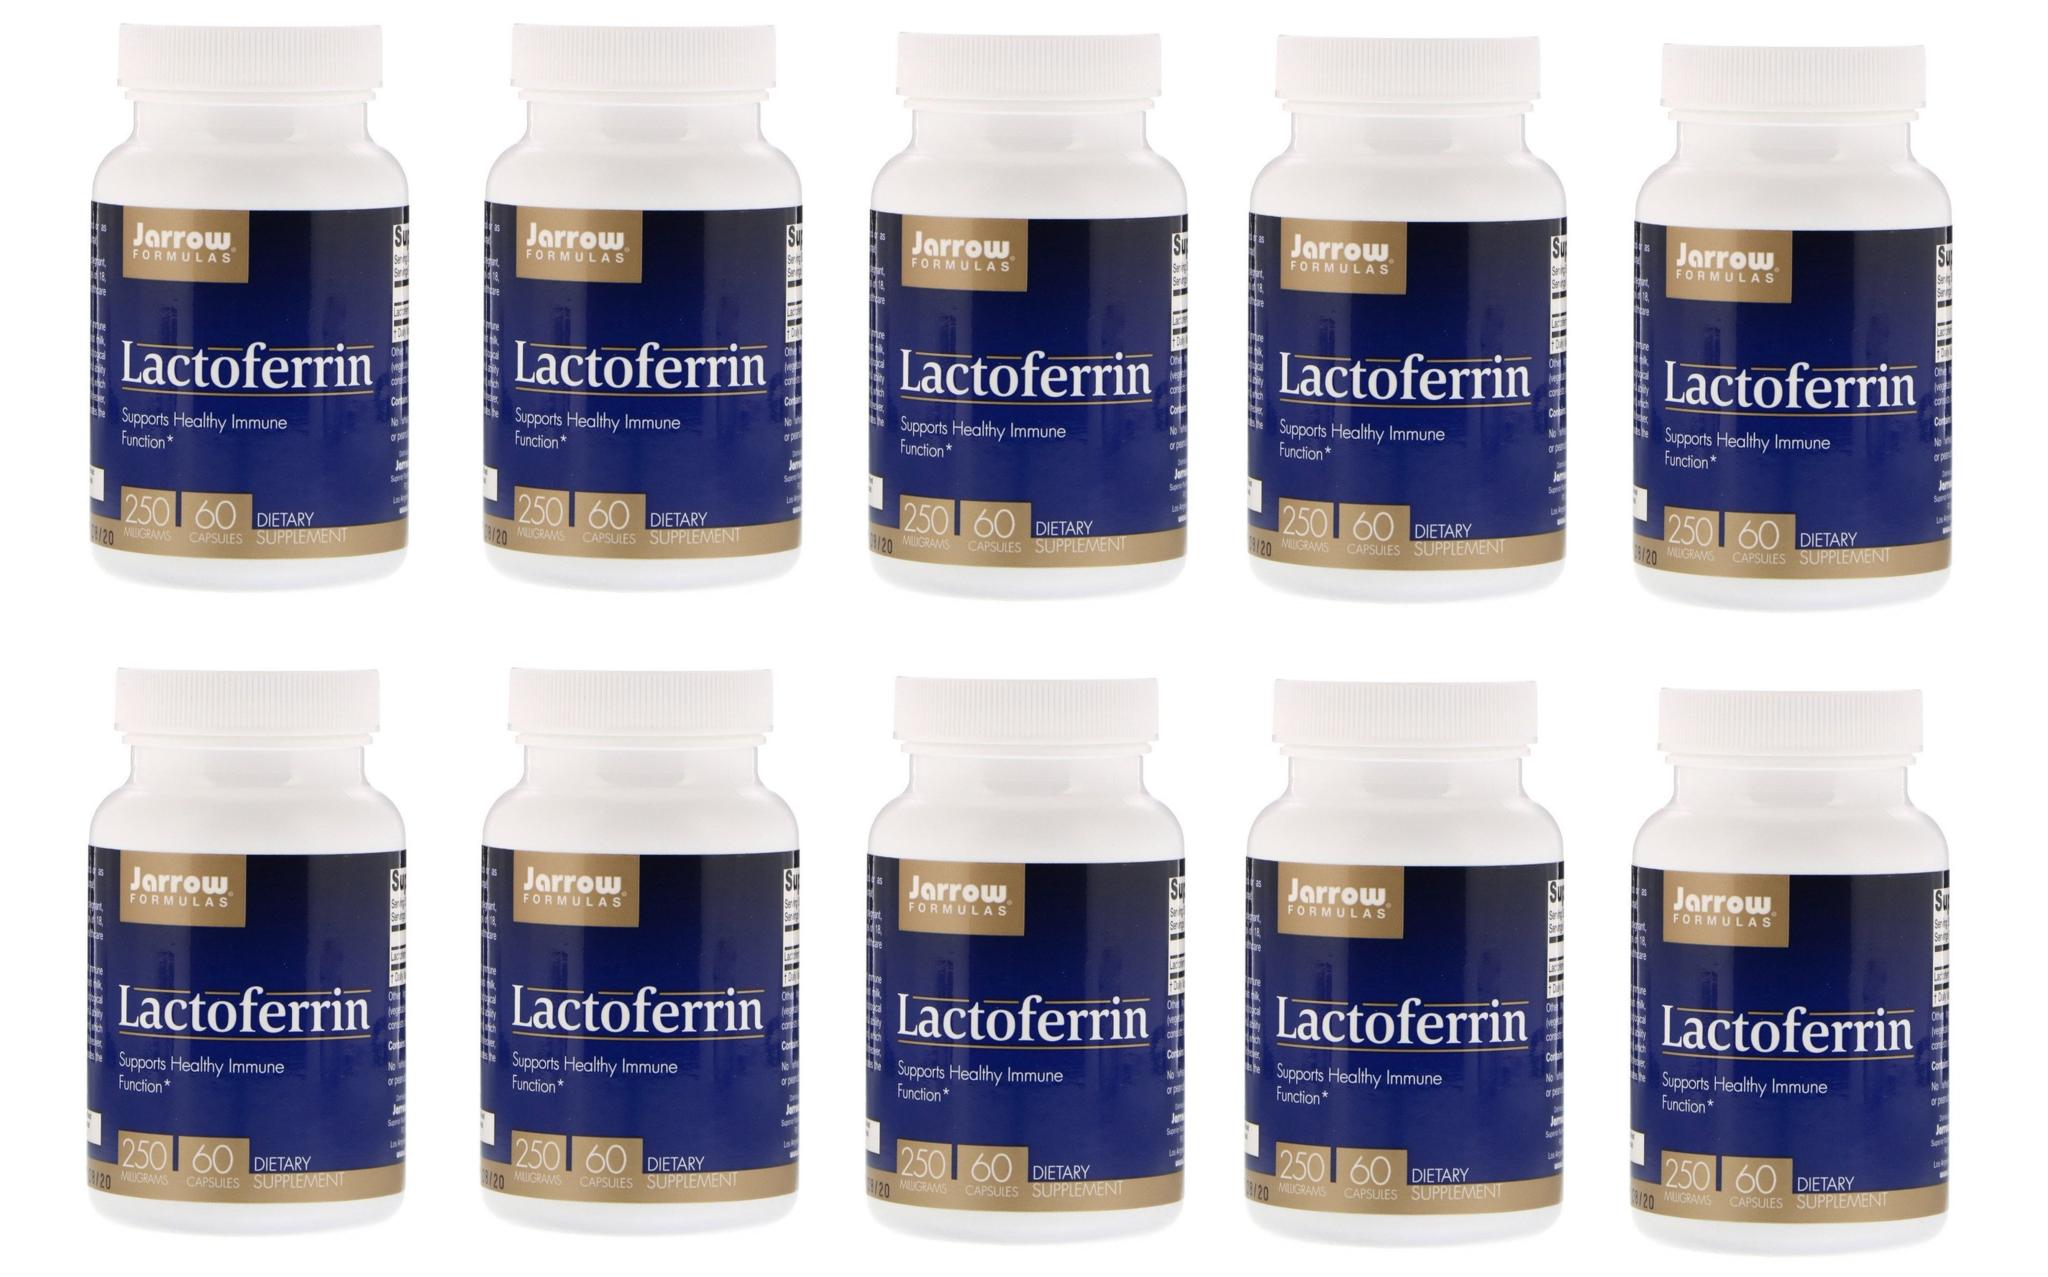 Jarrow Formulas Lactoferrin, 250 Mg, 60 Capsules, 10-packs